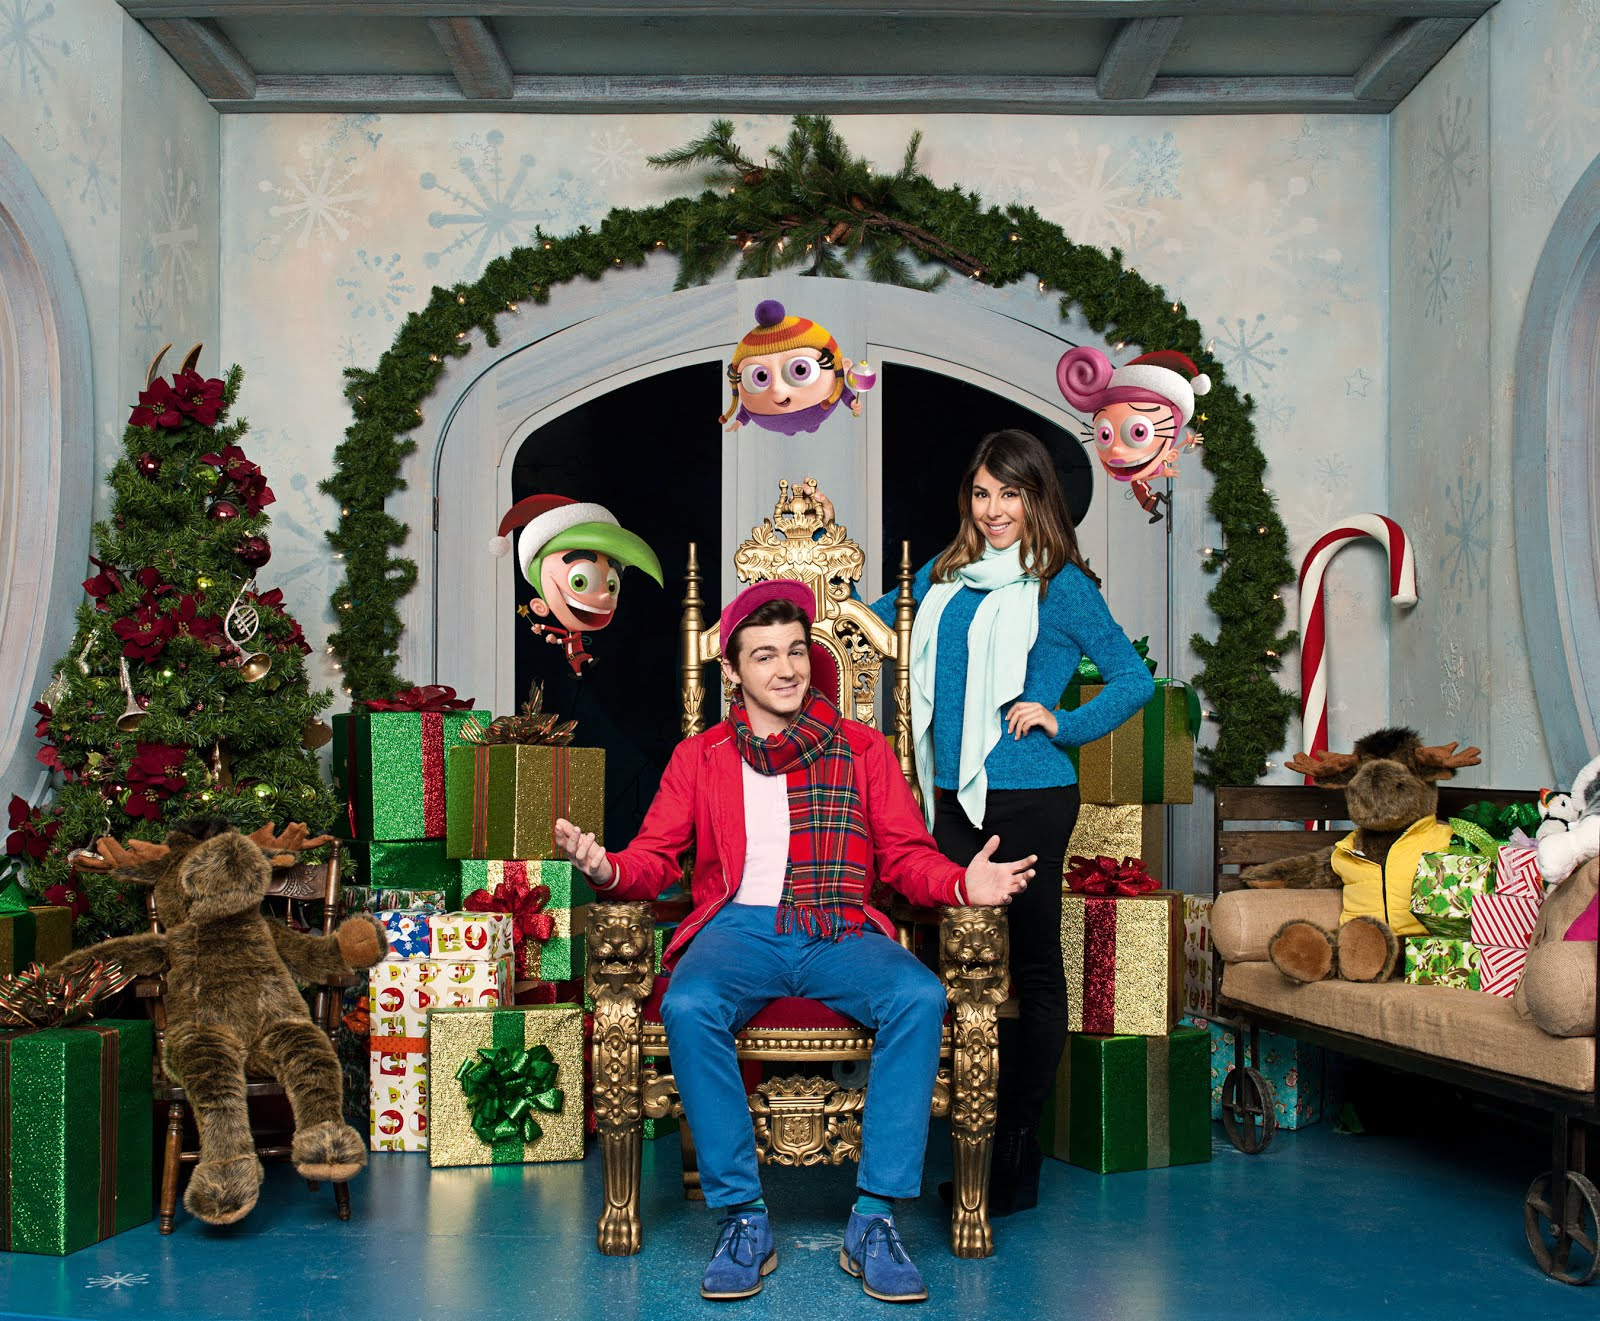 Drake And Josh Christmas Movie Cast.Nickalive It S A Fairly Odd Christmas On Nickelodeon